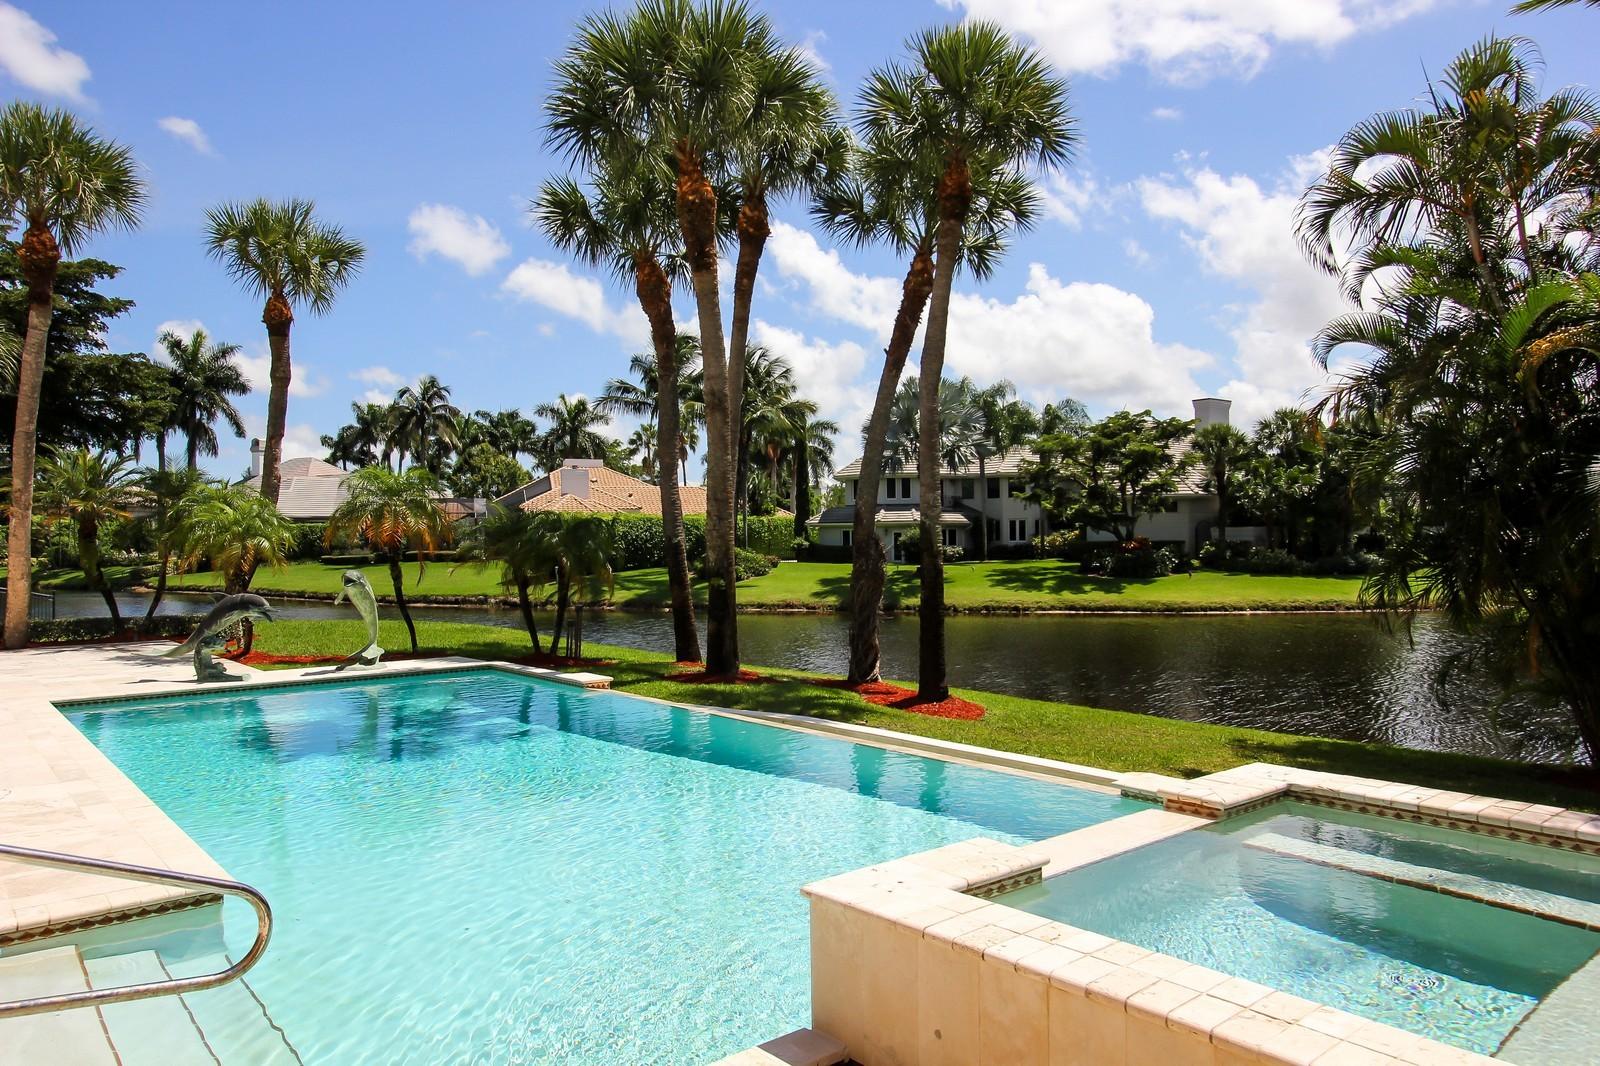 Real Estate Photography - 7015 Ayrshire Ln, Boca Raton, FL, 33496 - Pool